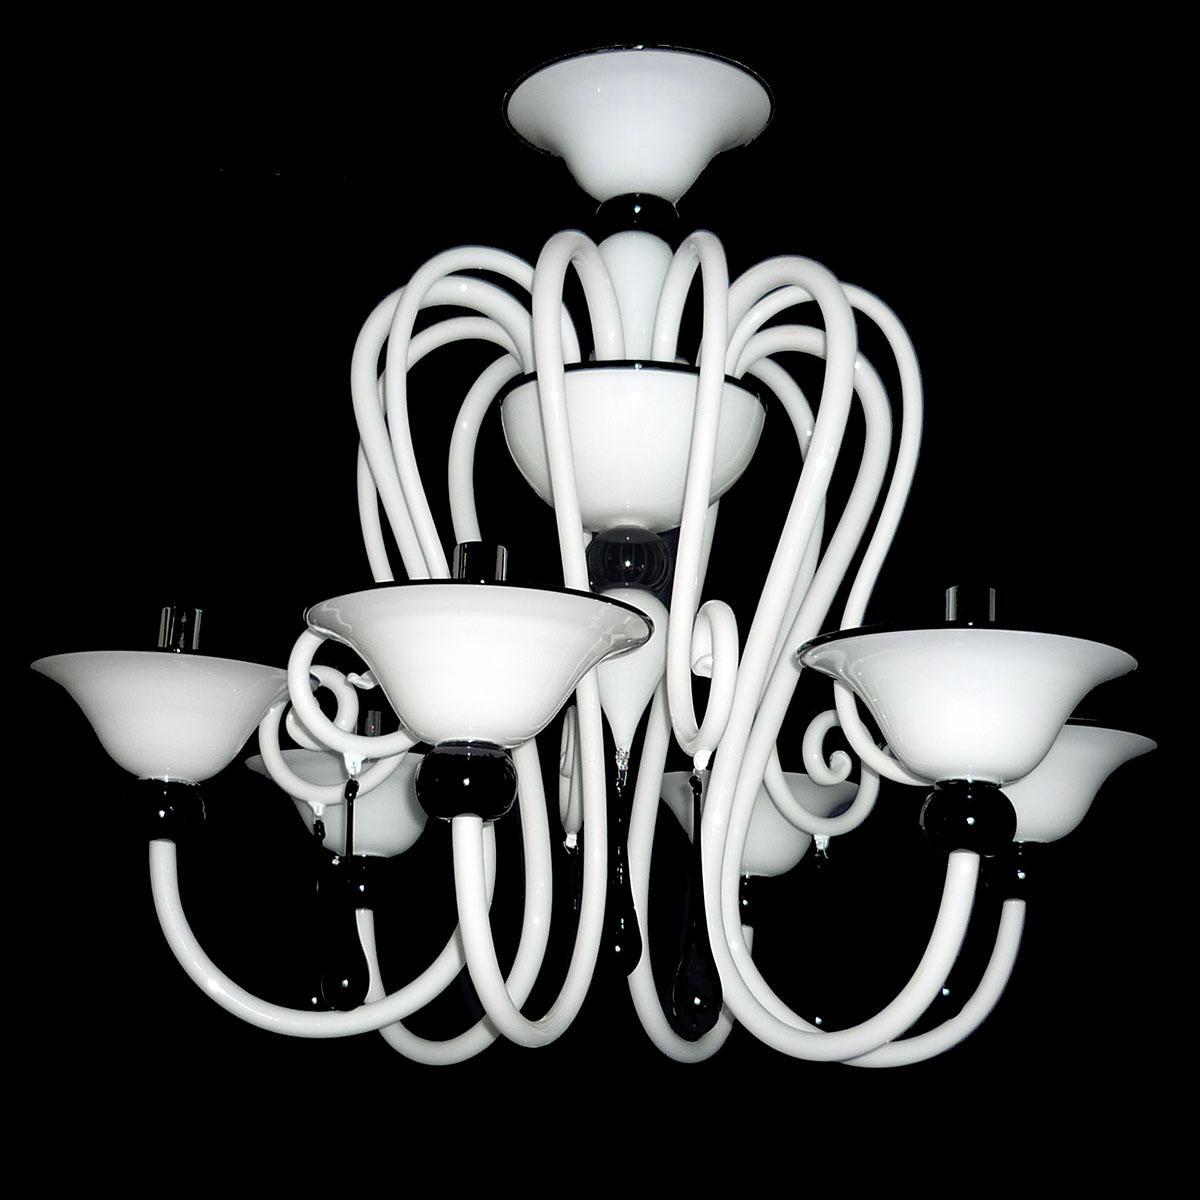 """Serpico"" Murano glass chandelier - 6 lights - white and black"